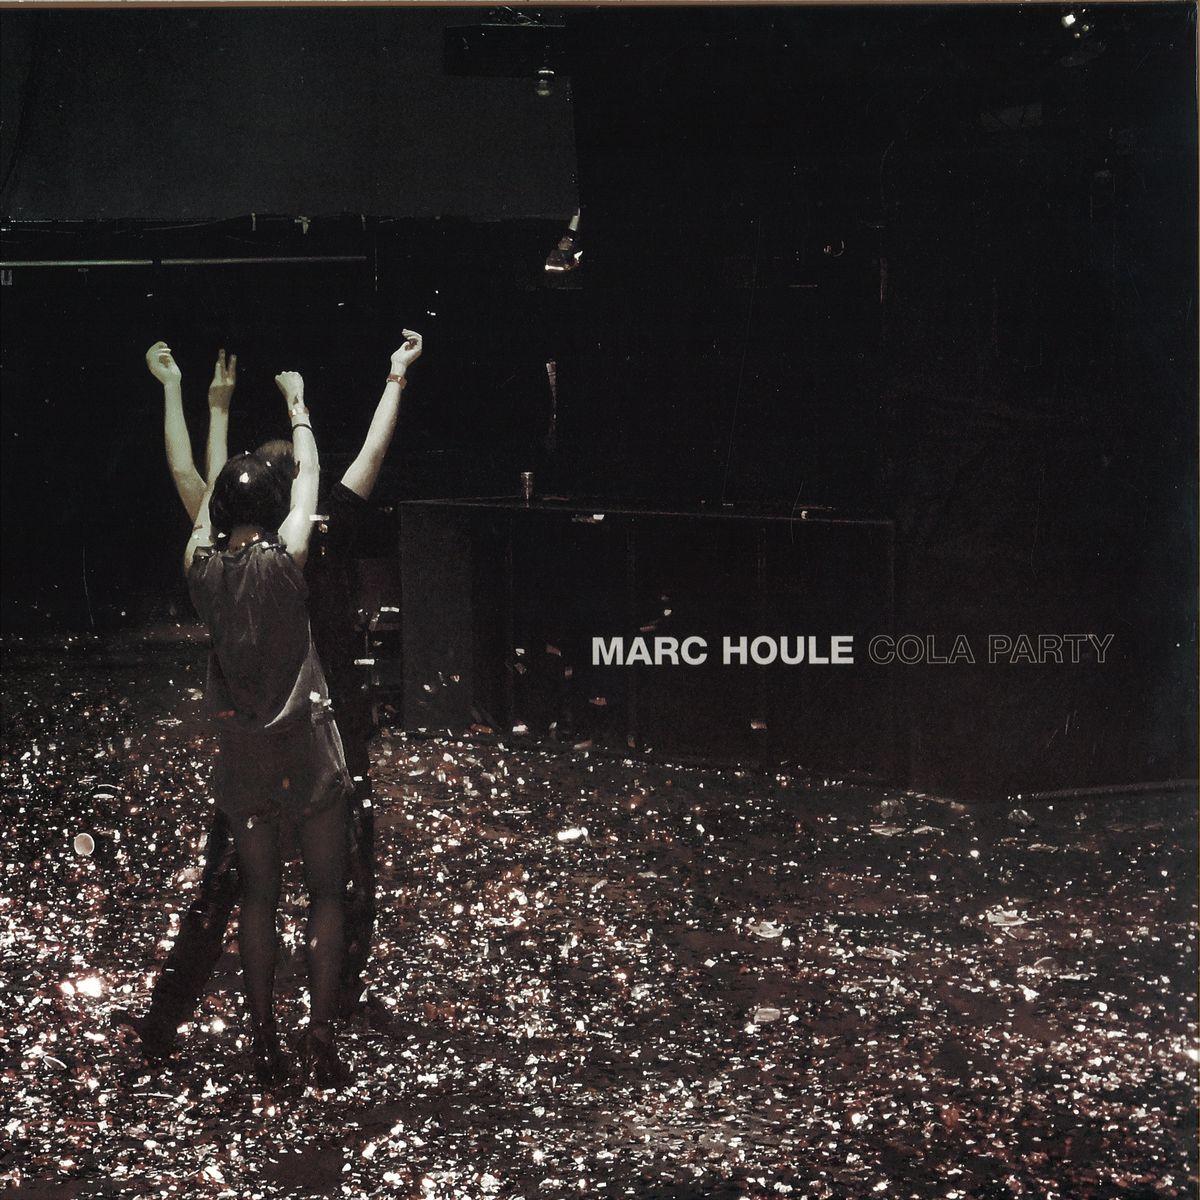 Marc Houle – Cola Party (Item & Things)